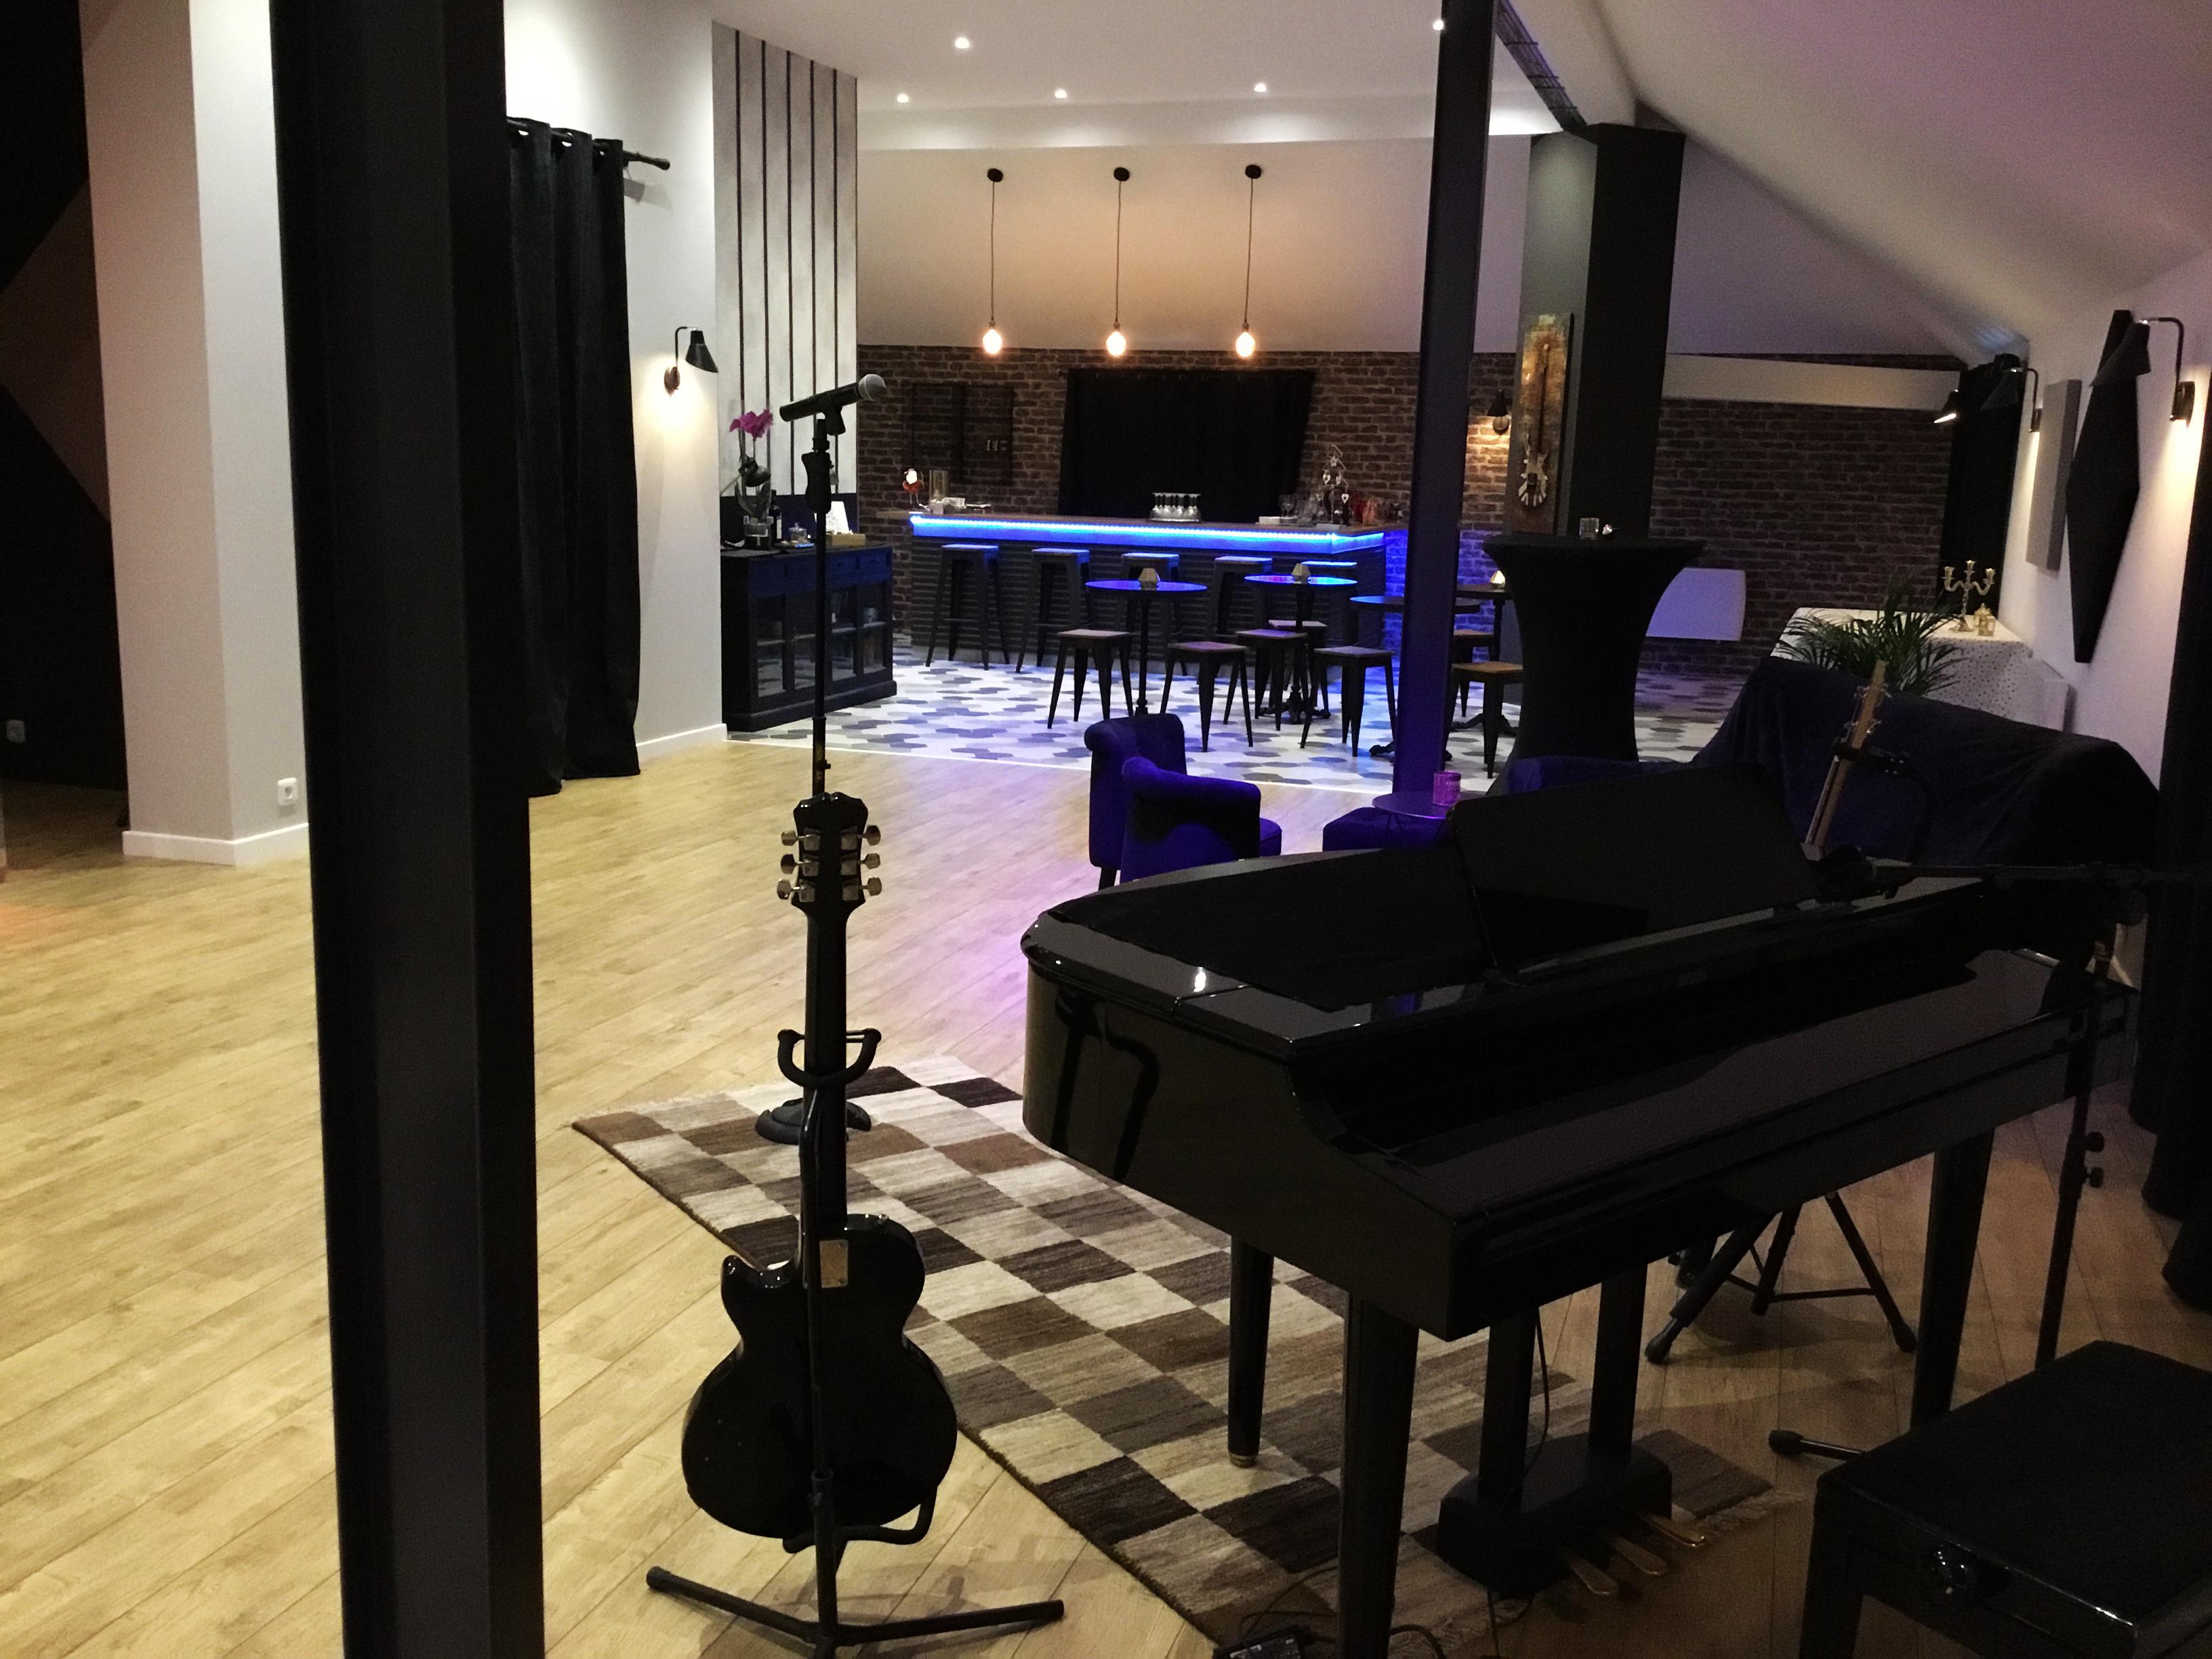 DERRIERE PIANO